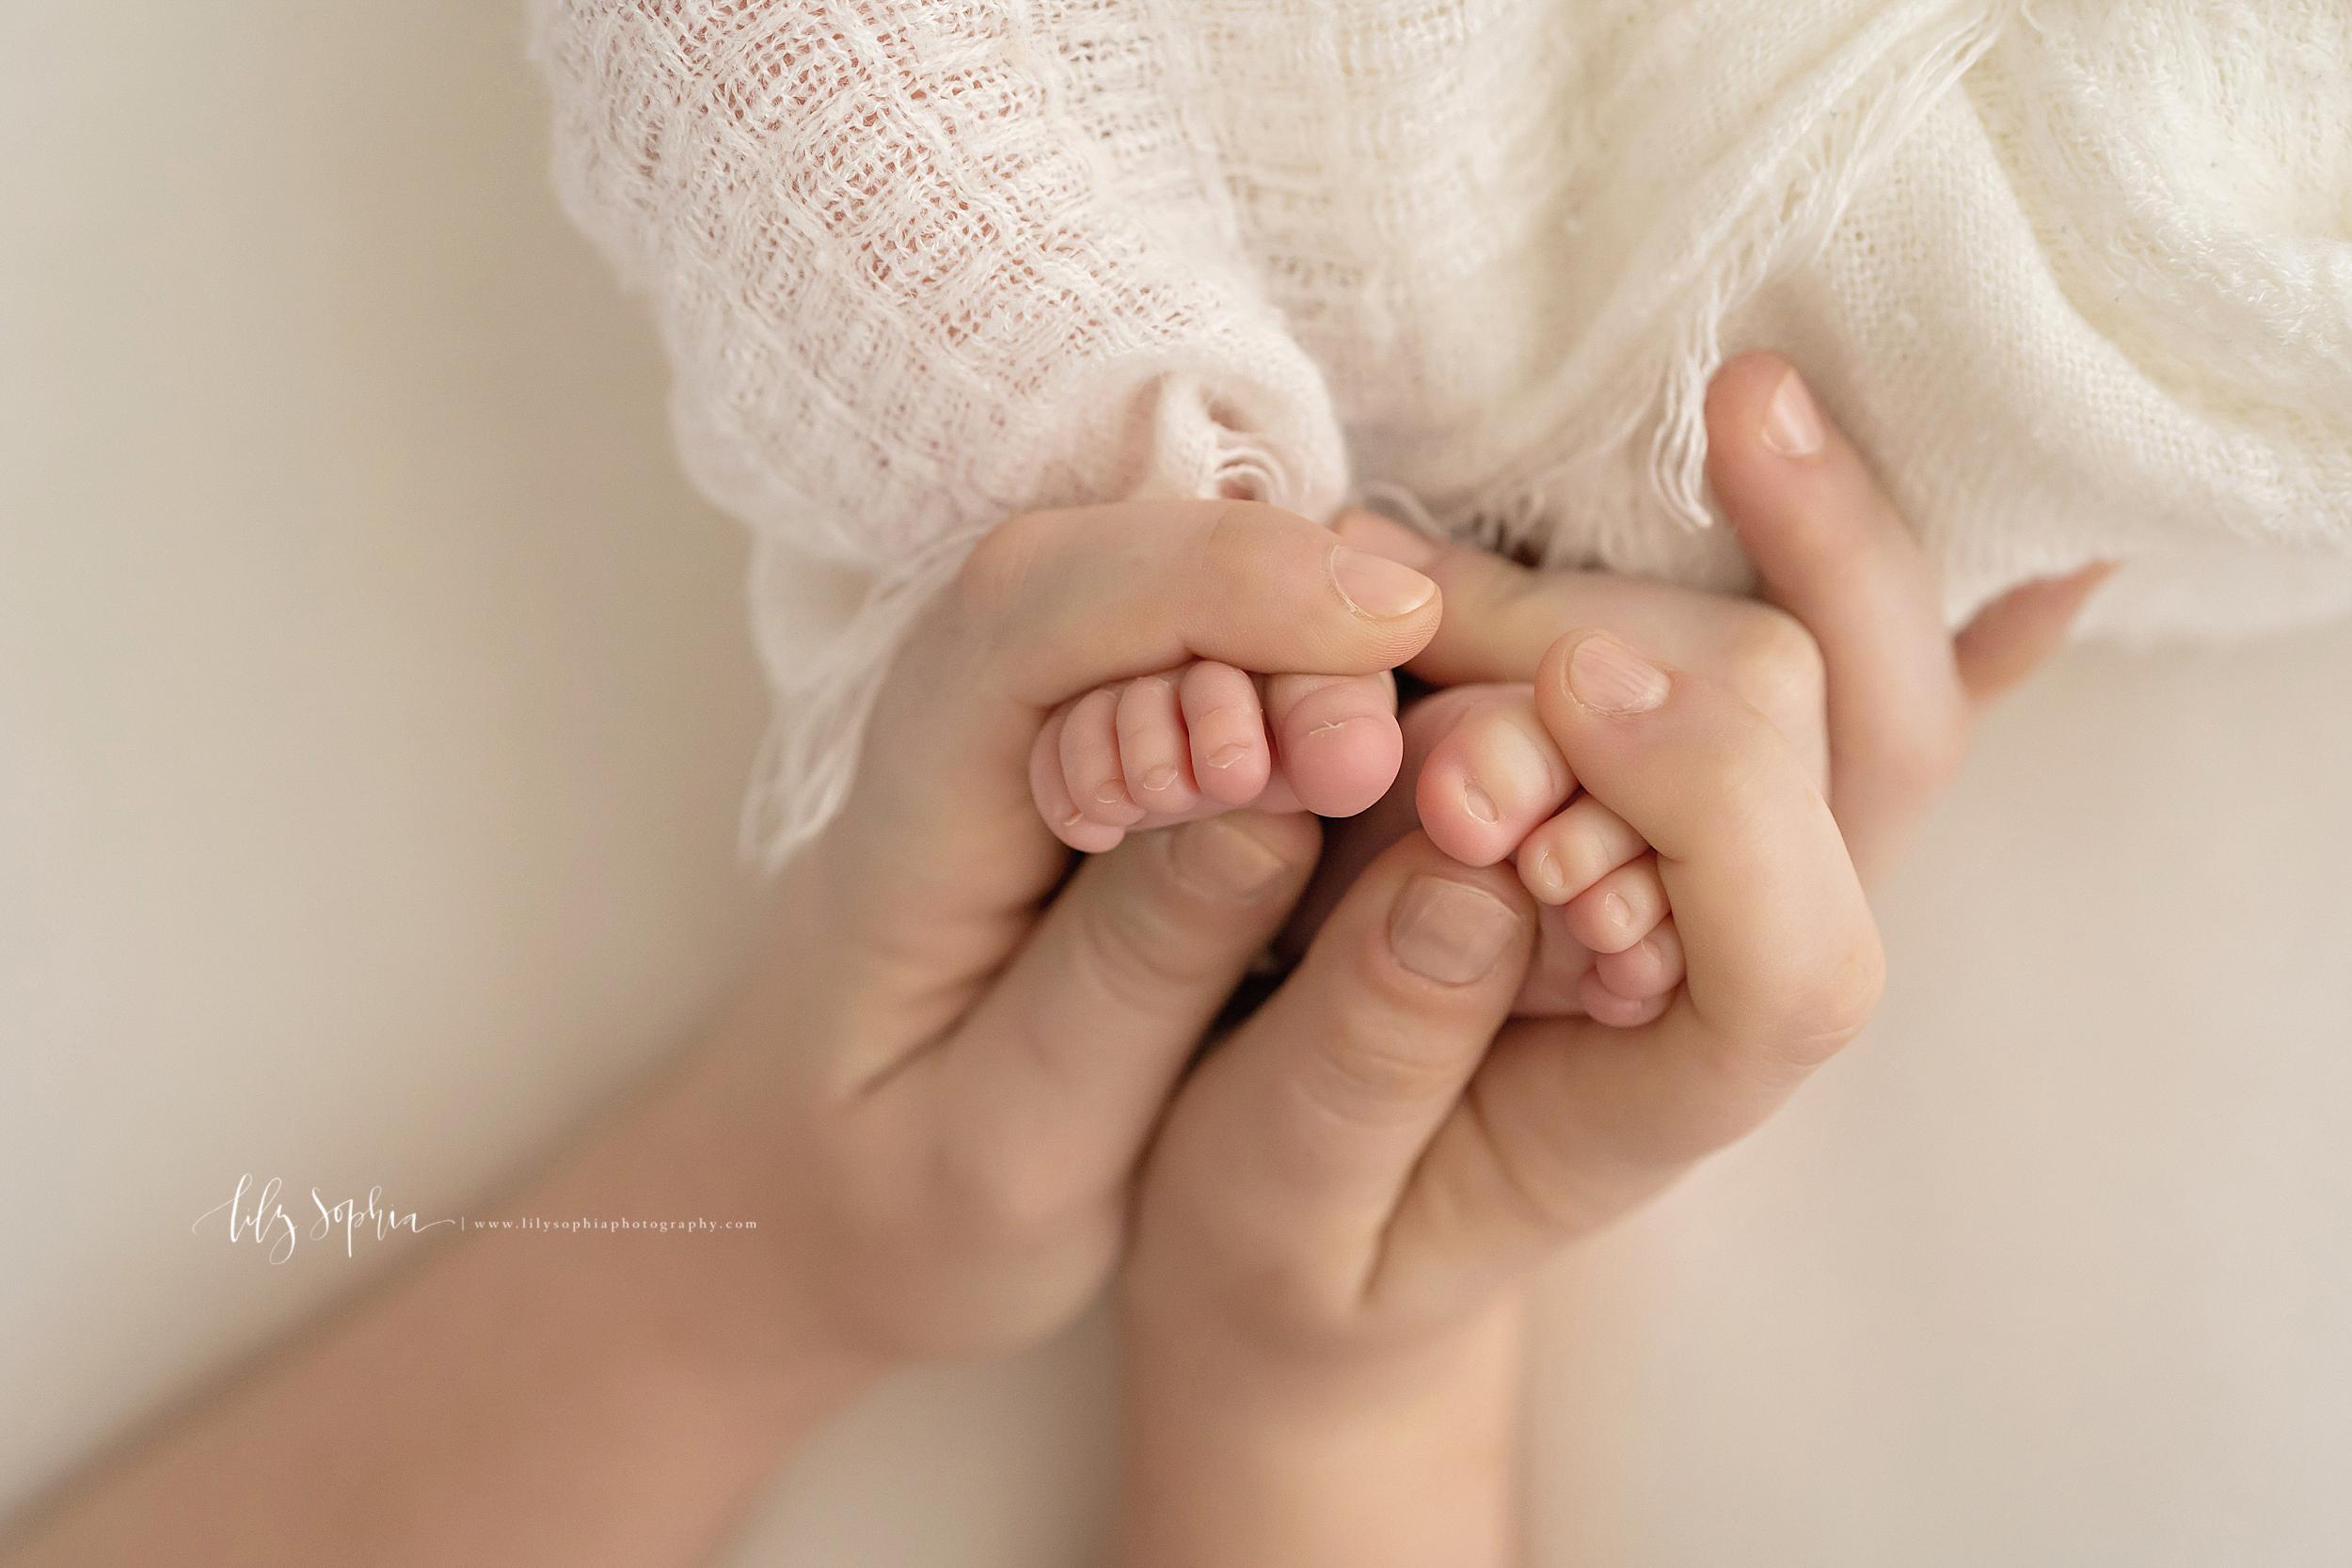 atlanta-midtown-brookhaven-ashford-dunwoody-virginia-highlands-roswell-decatur-lily-sophia-photography-newborn-baby-boy-big-brother-family-studio-session_0611.jpg